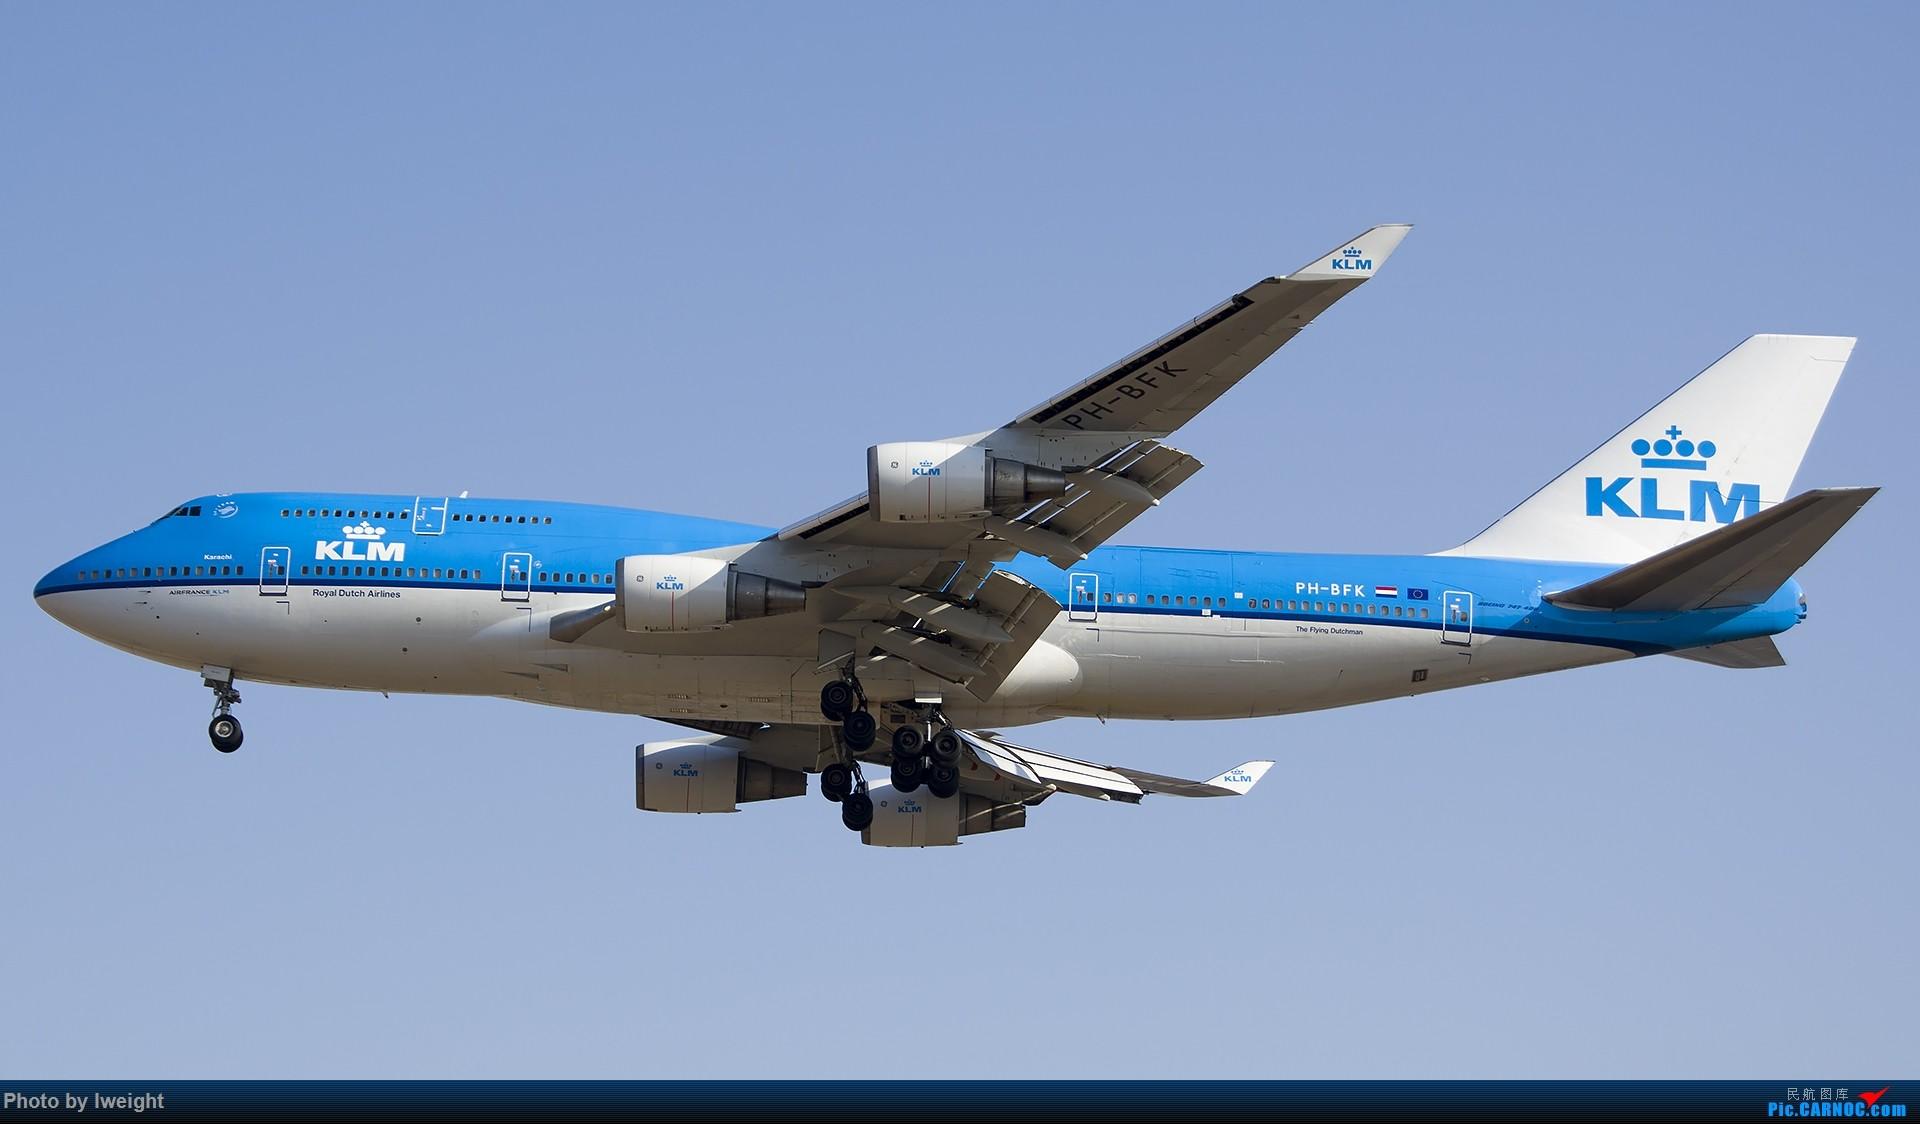 Re:[原创]庆祝升级777,发上今天在首都机场拍的所有飞机【2014-12-14】 BOEING 747-400 PH-BFK 中国北京首都国际机场